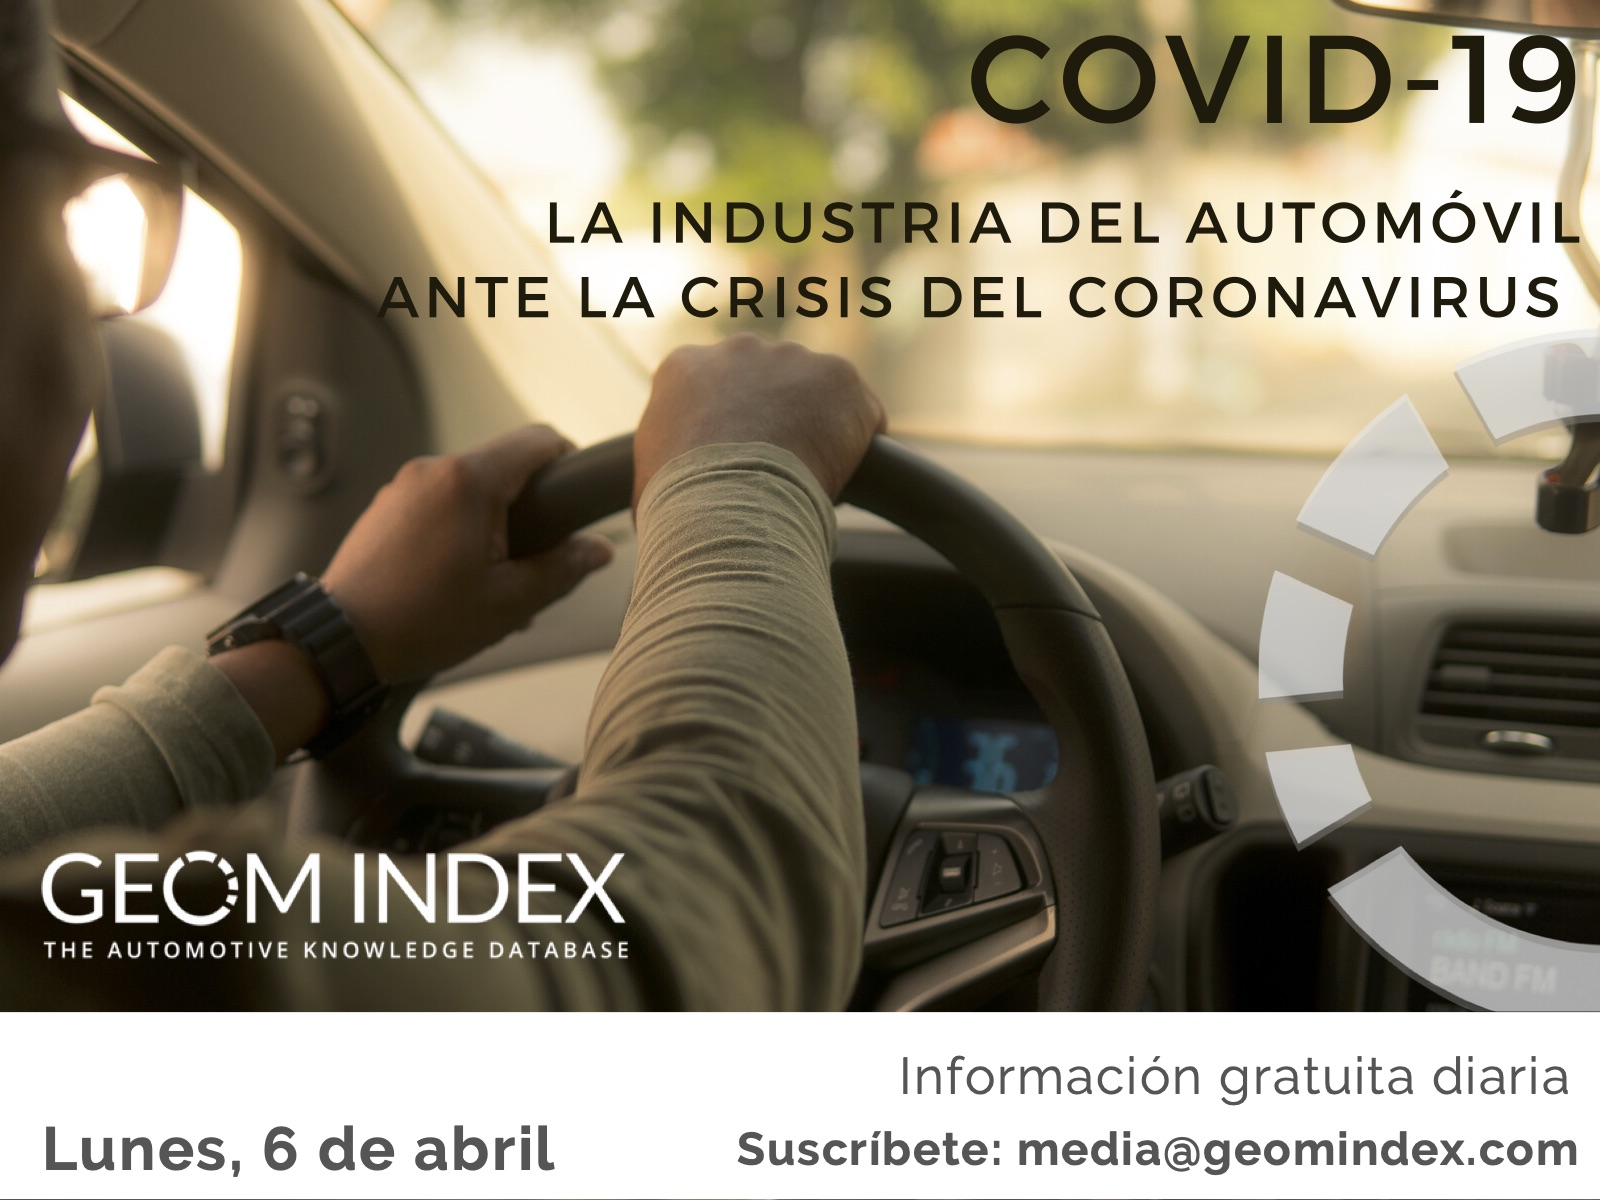 Informe 6 de abril – La industria del automóvil ante la crisis del Covid-19